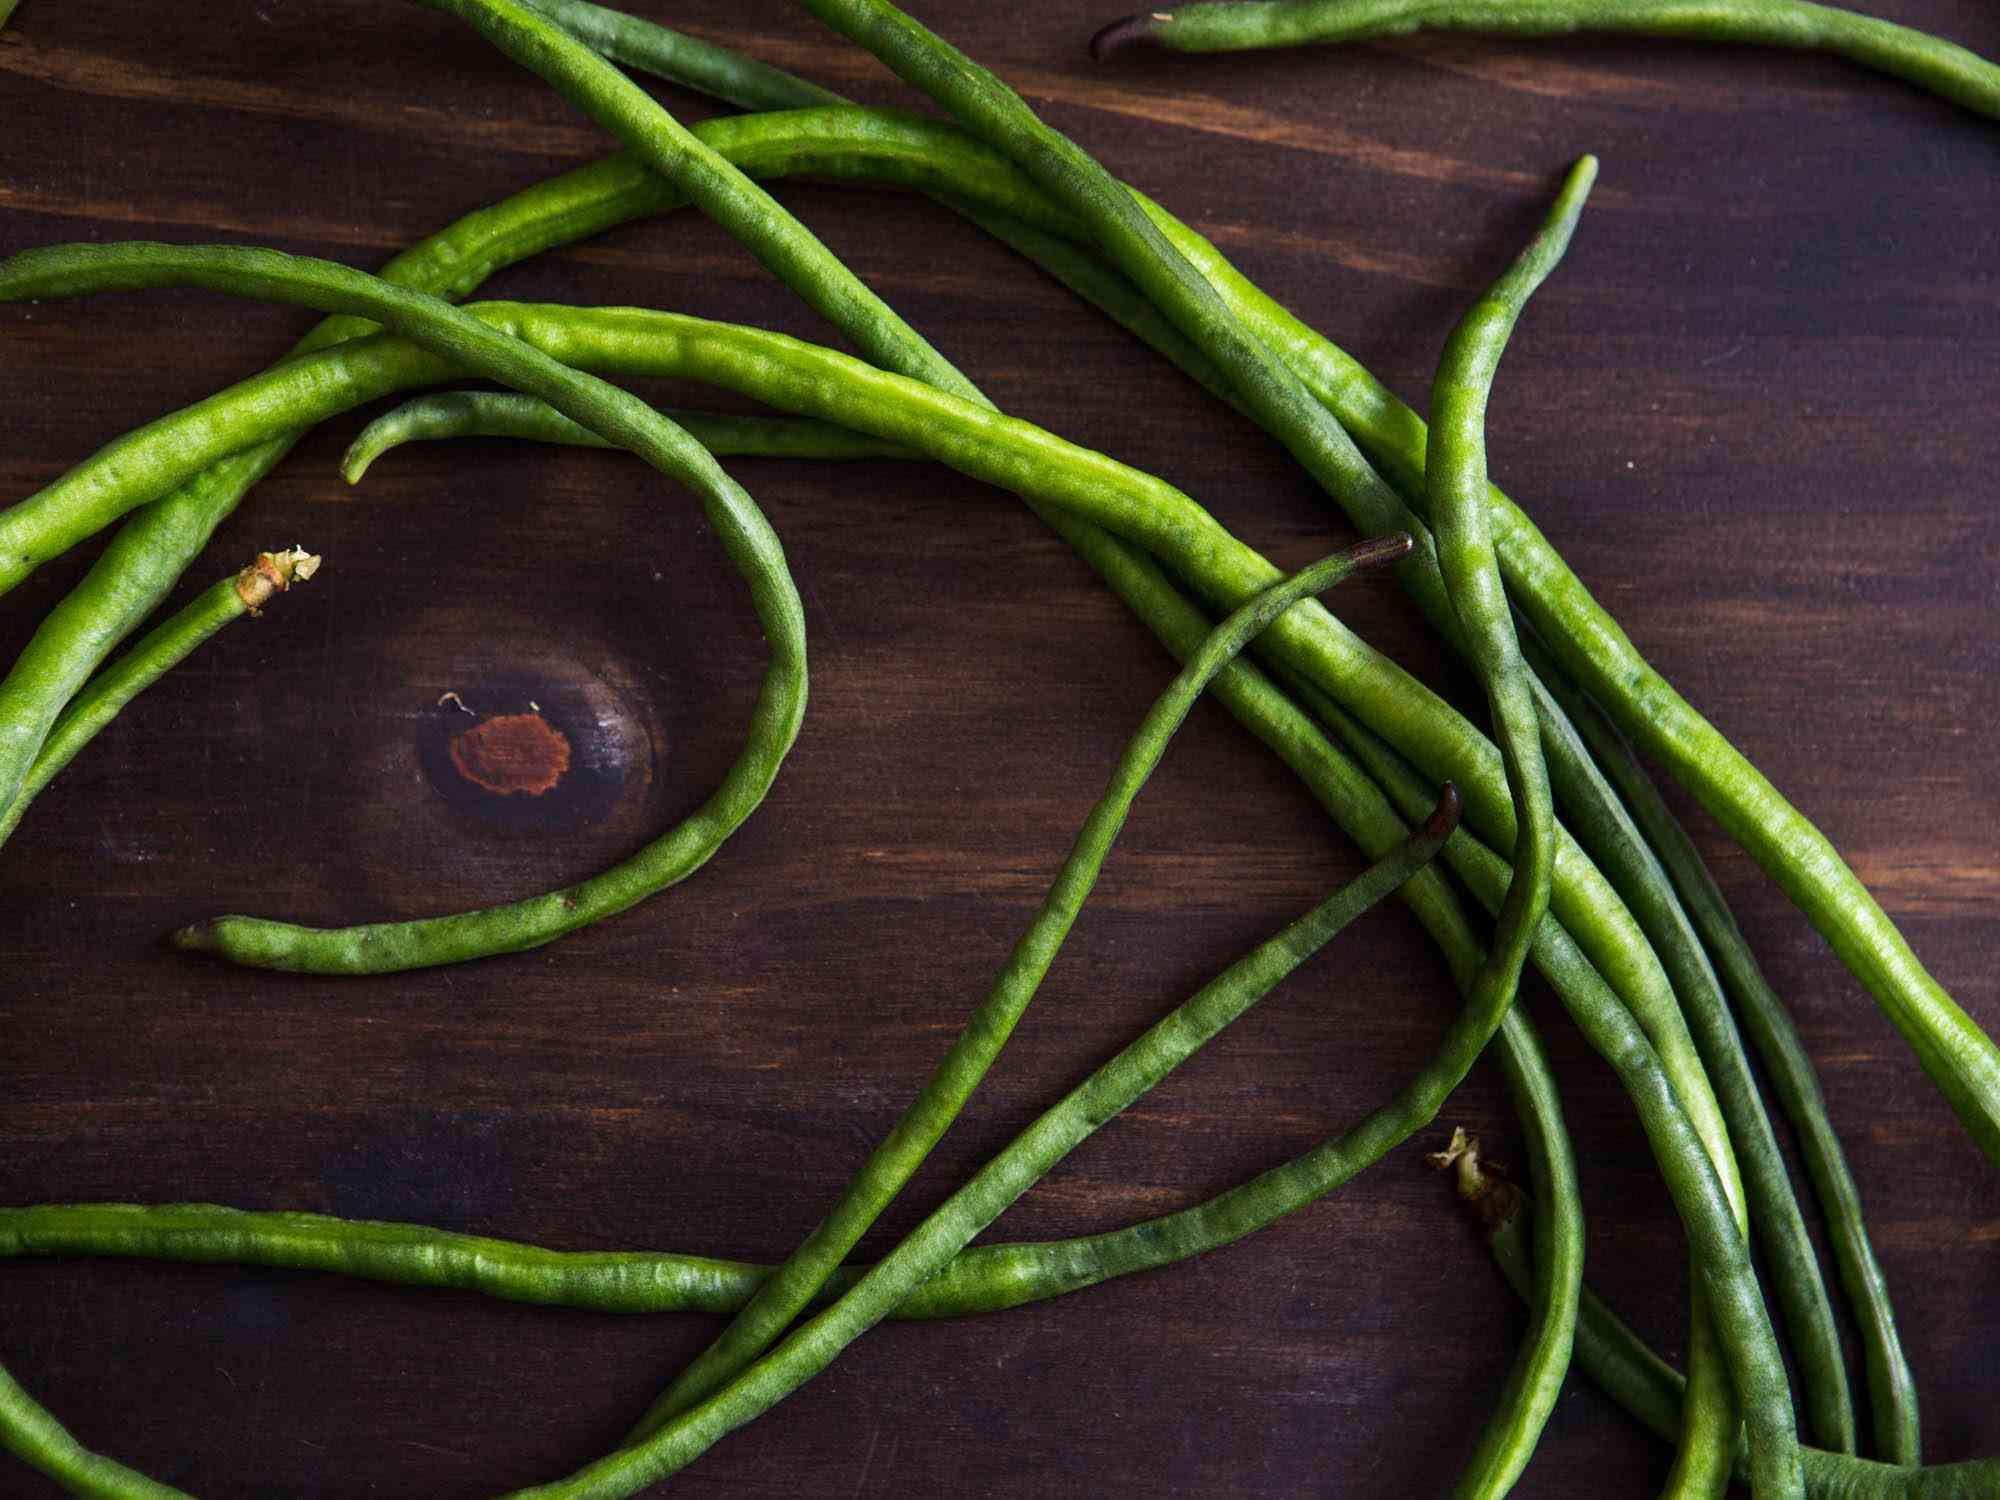 20150715-braised-long-beans-vicky-wasik-1.jpg